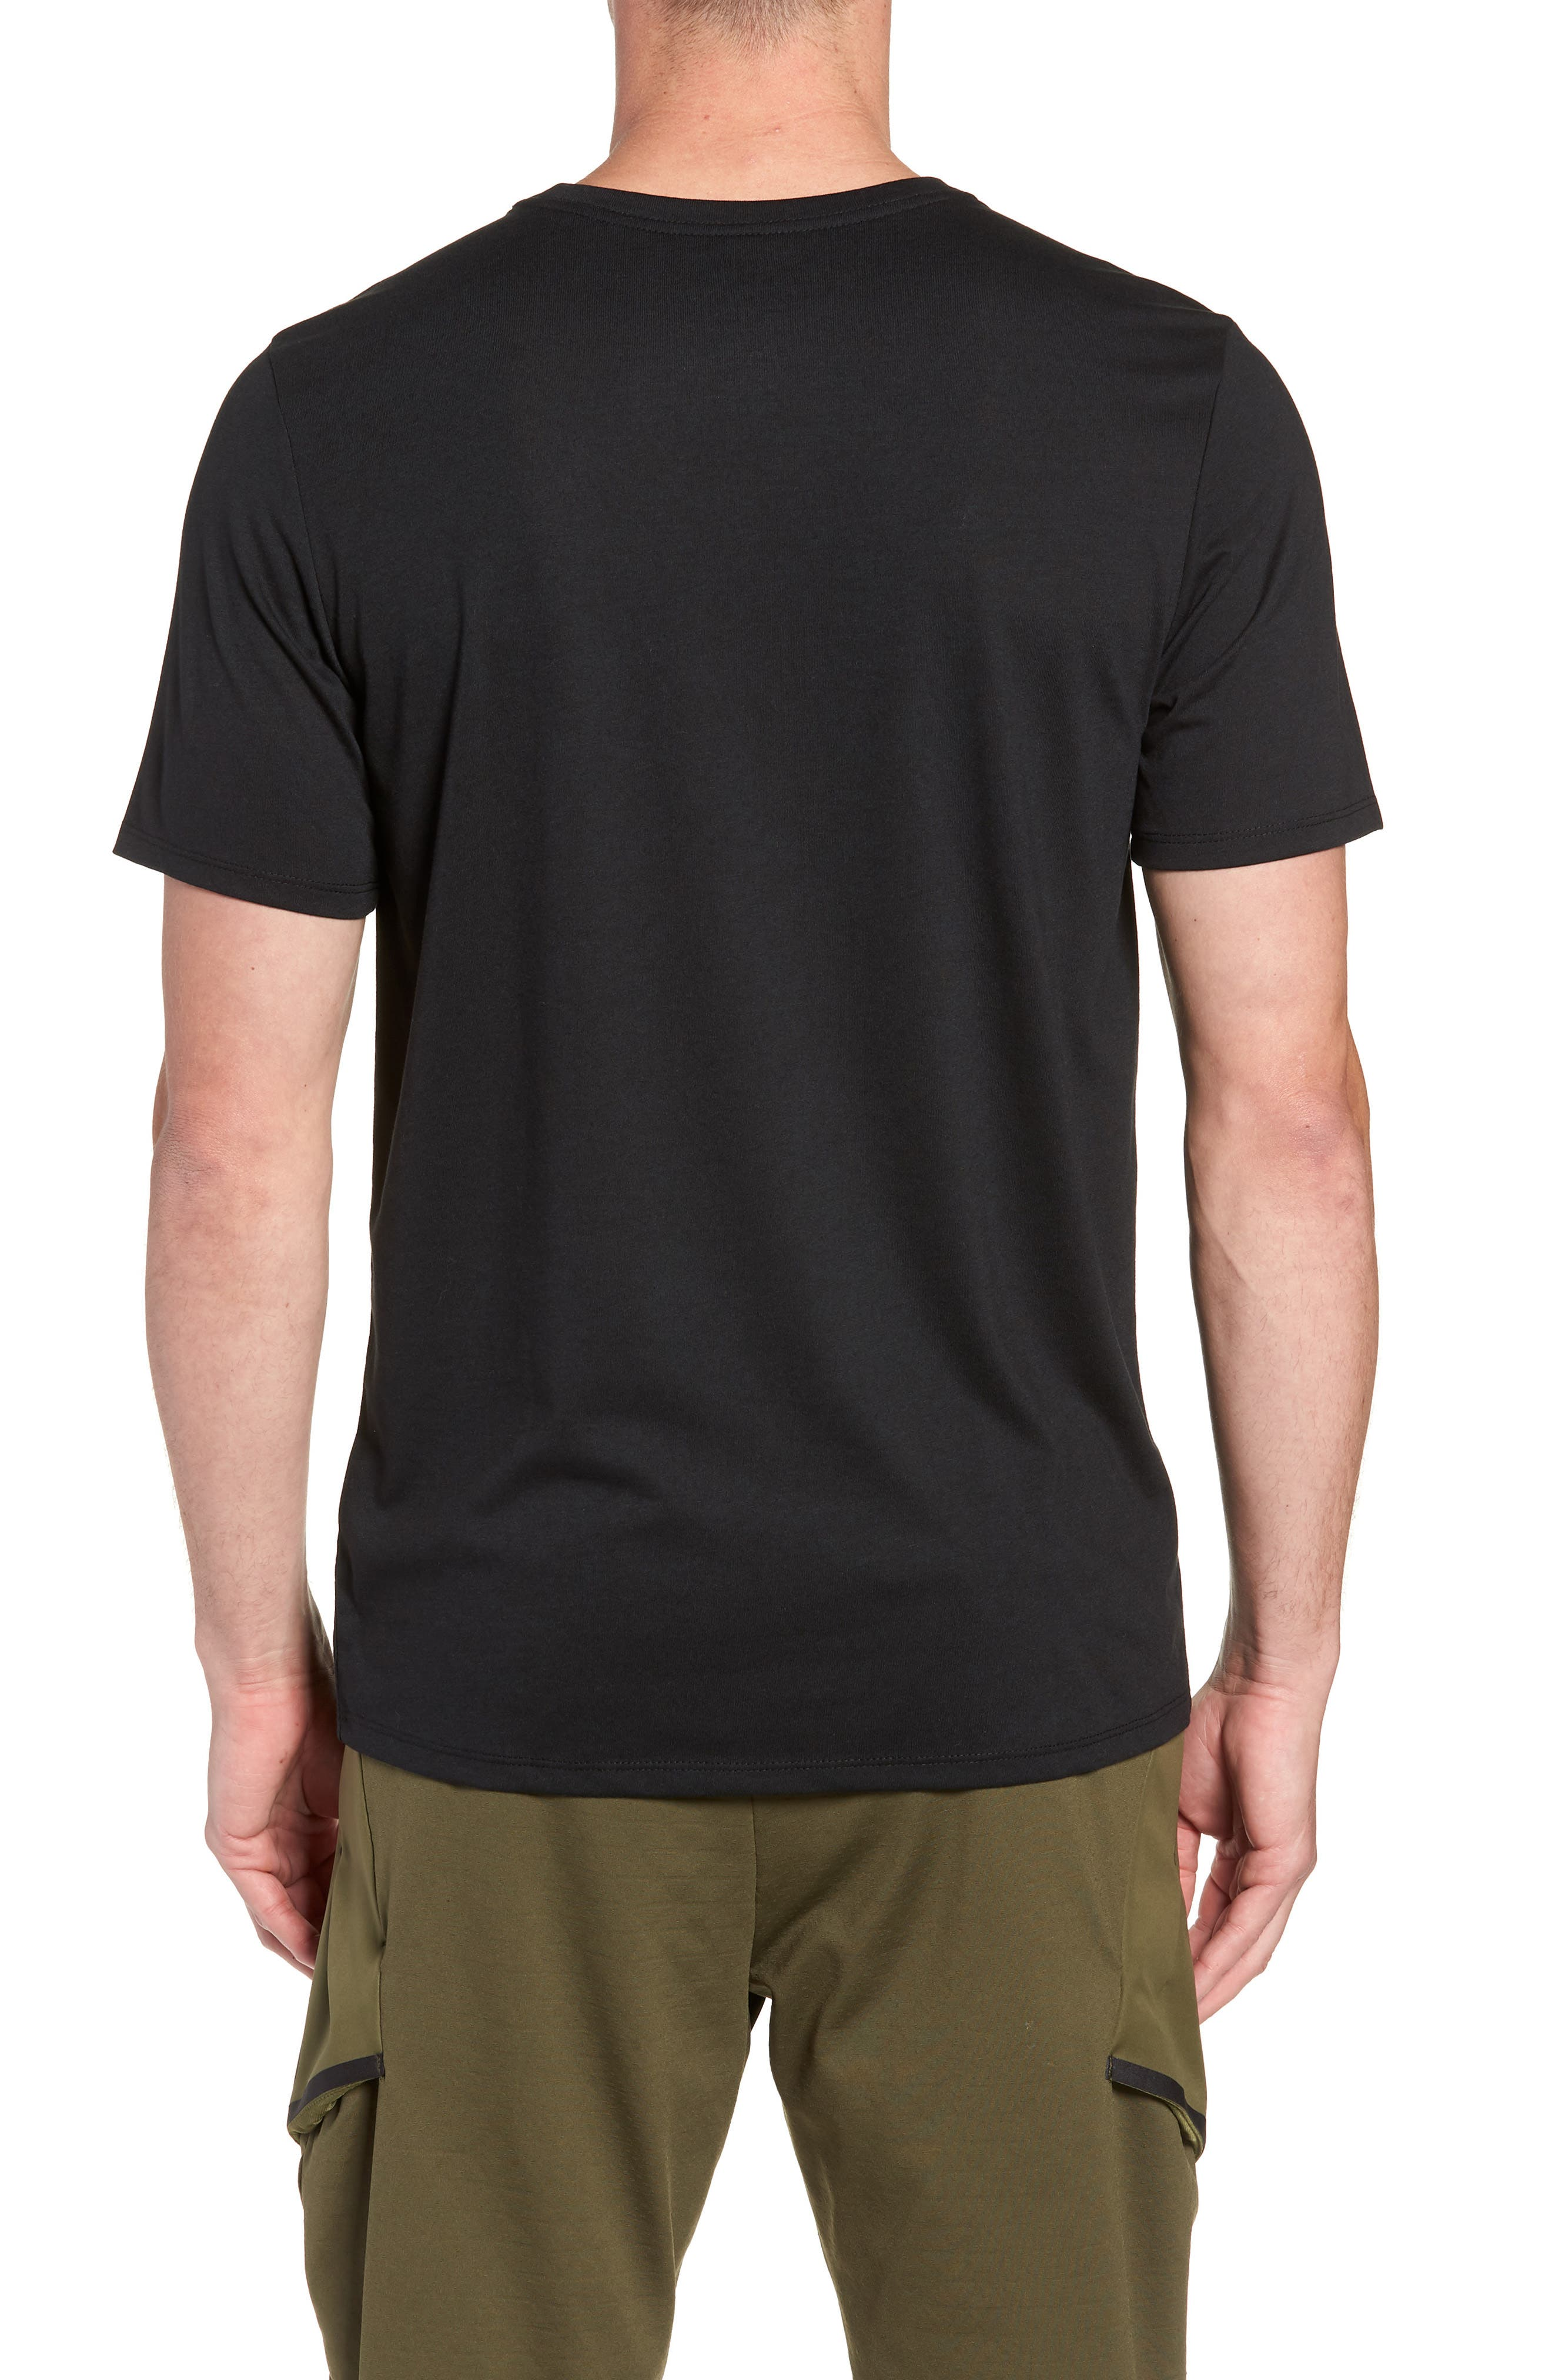 Air 1 T-Shirt,                             Alternate thumbnail 2, color,                             011